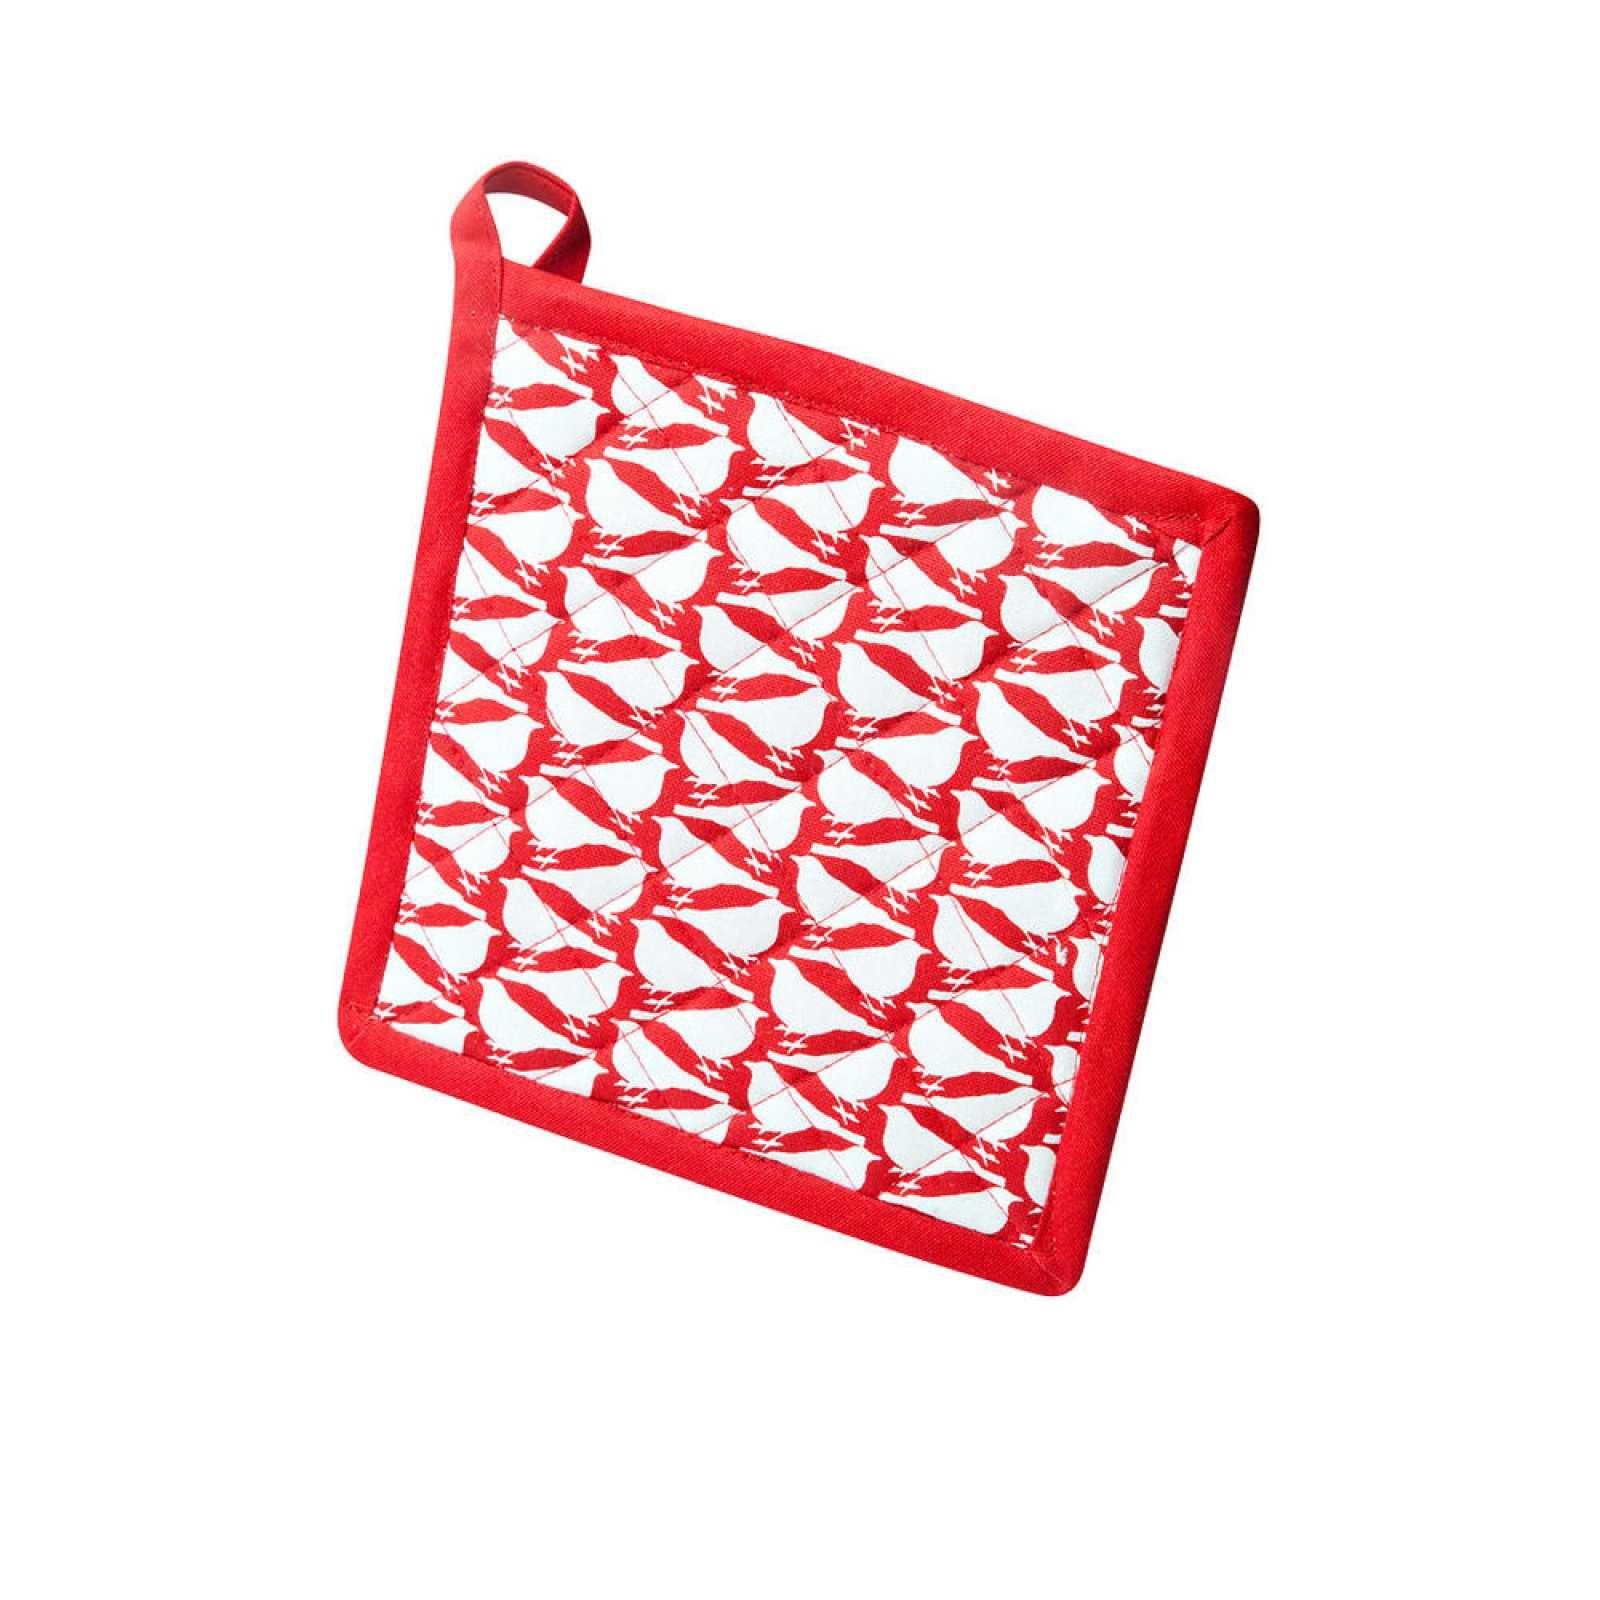 Онлайн каталог PROMENU: Прихватка кухонная Winkler FANTASY RED, 20х20 см, красный Winkler 2719730000